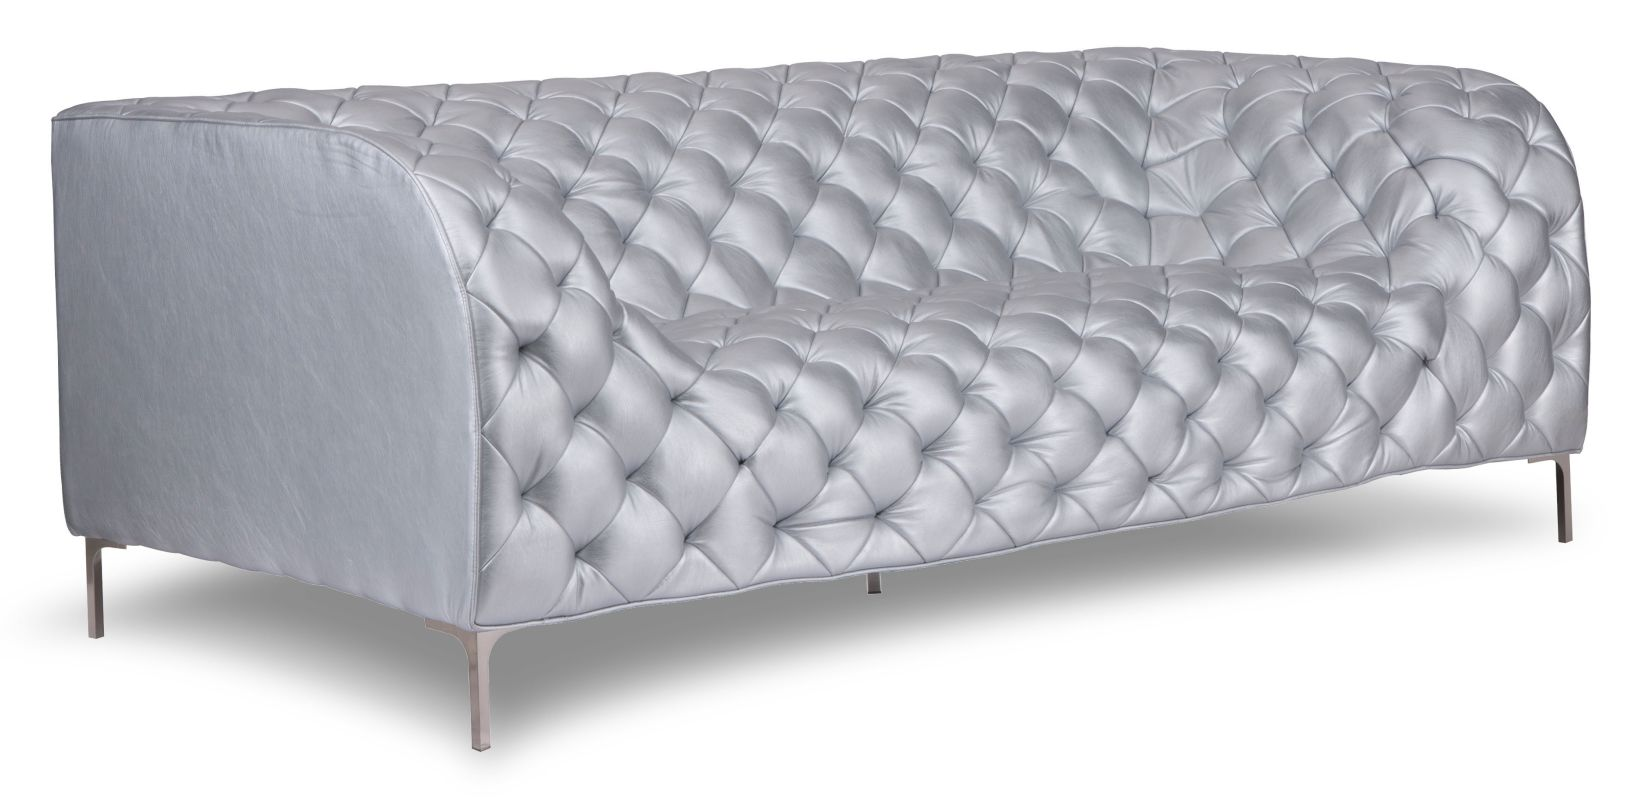 Zuo Modern Providence Sofa Providence Sofa Silver Furniture Sofas